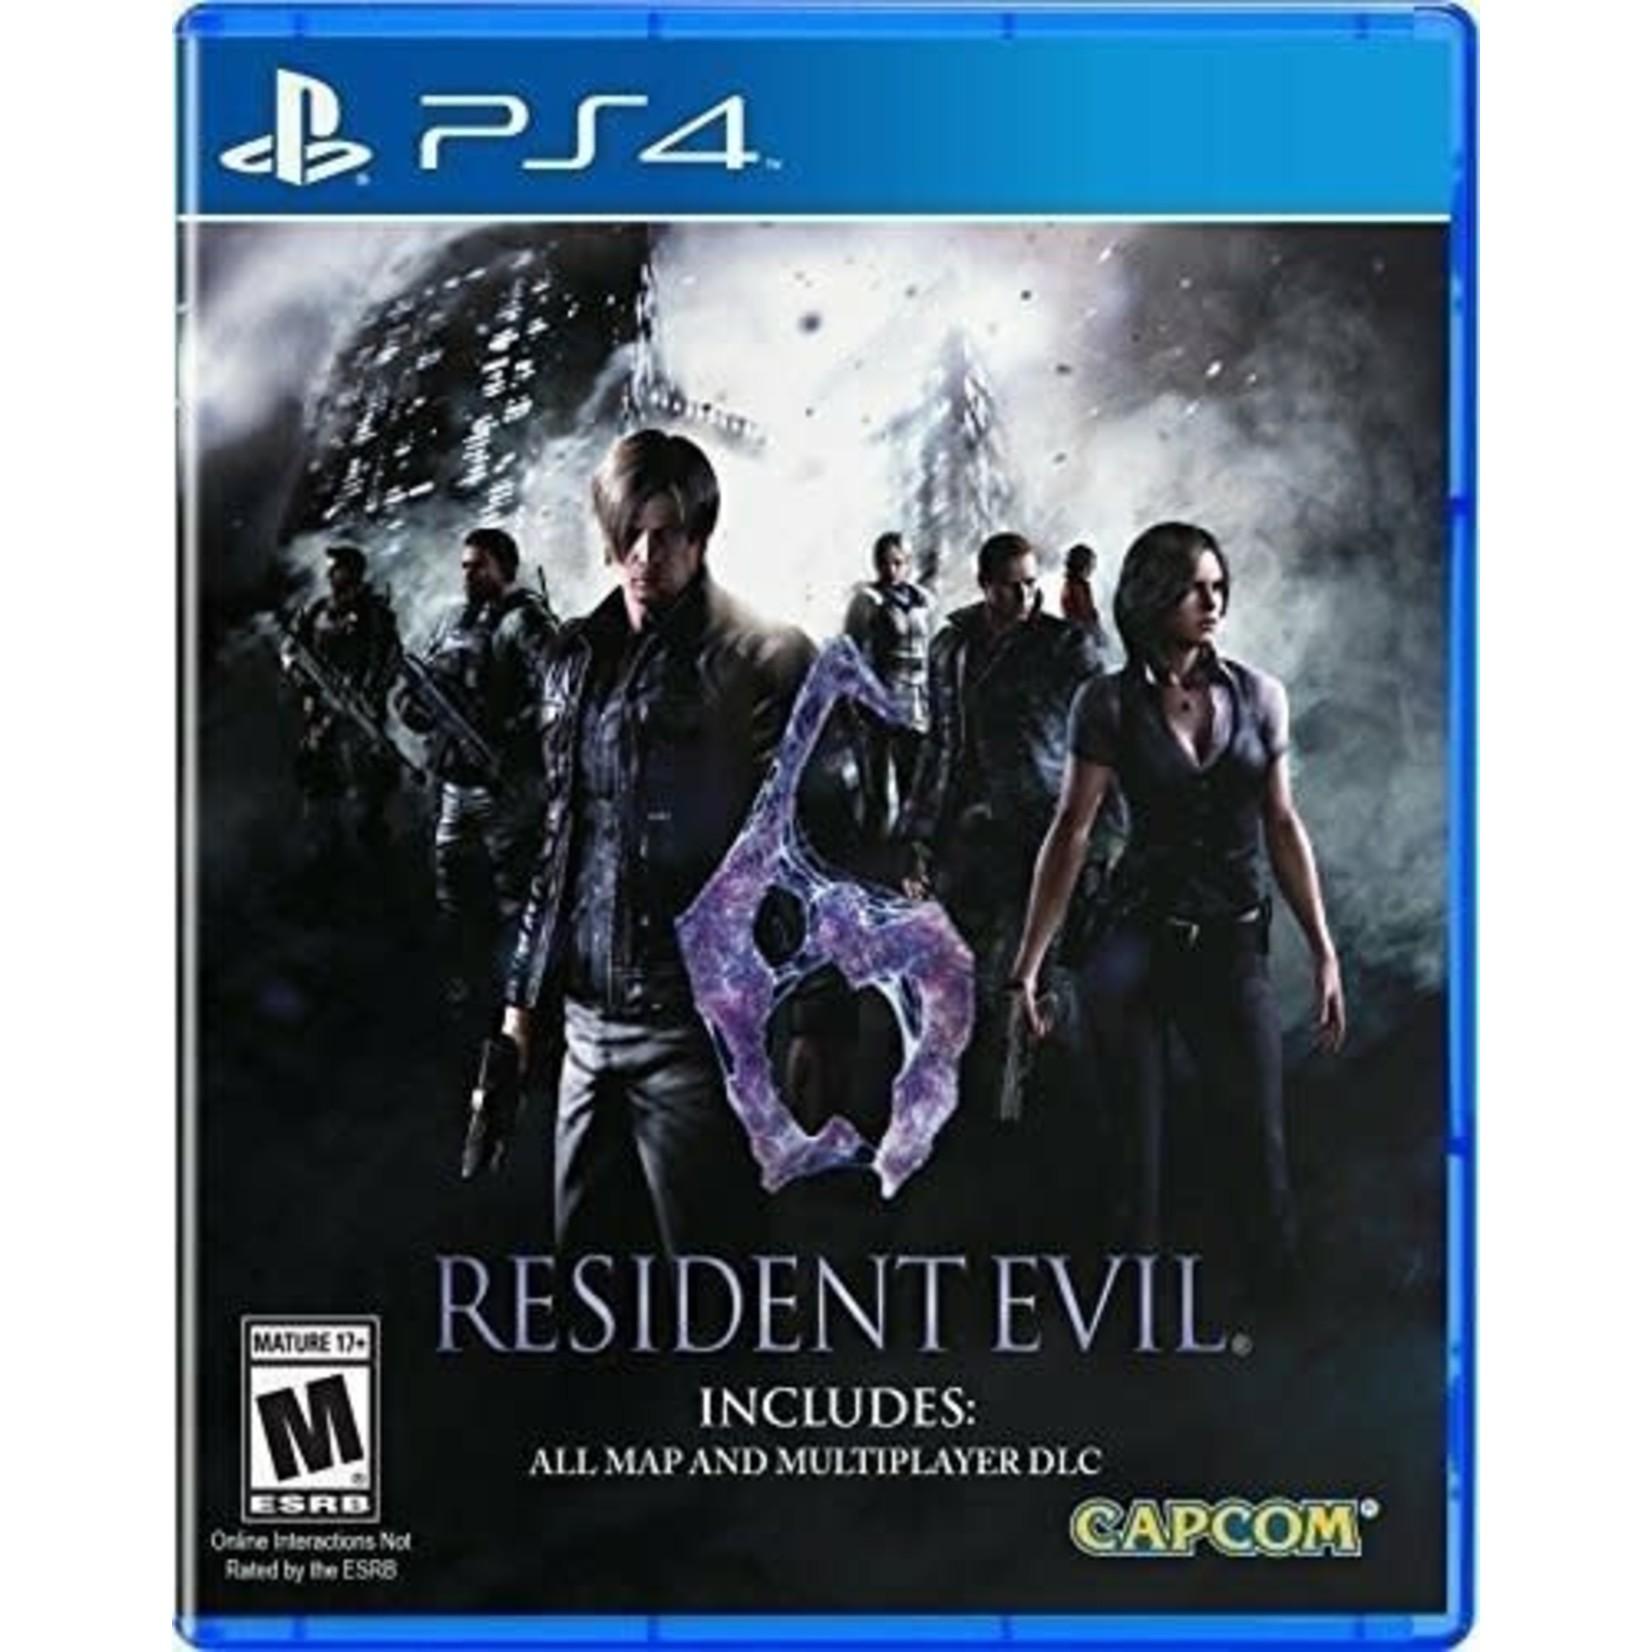 PS4-Resident Evil 6 HD